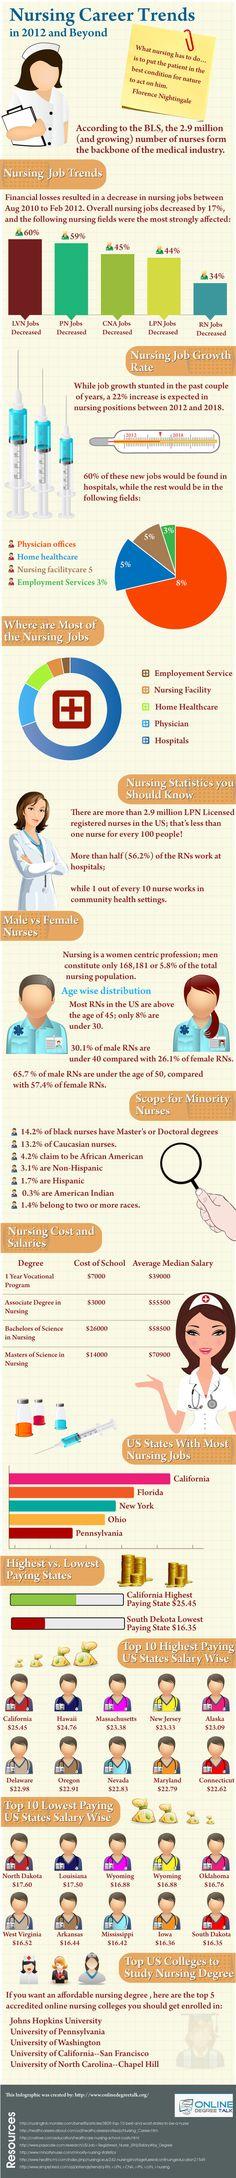 97 best Nursing Degrees images on Pinterest | Nursing career, Nurses ...